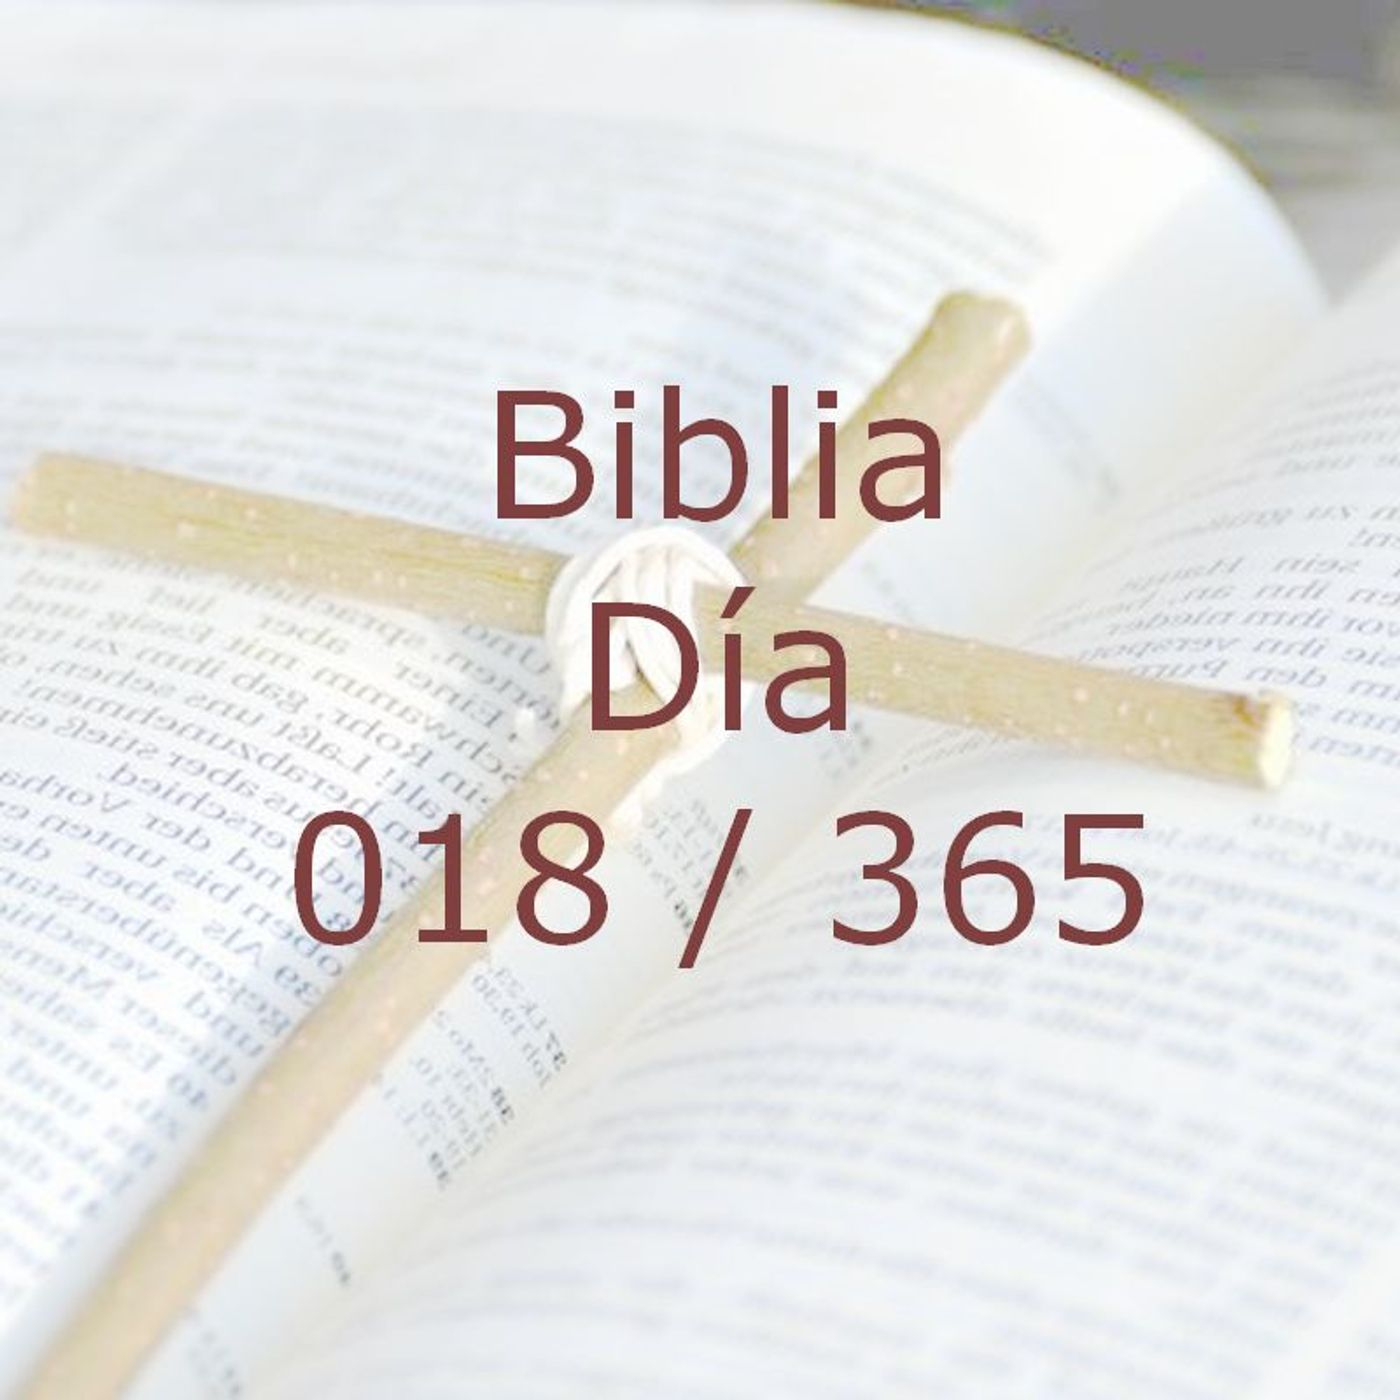 365 dias para la Biblia - Dia 018